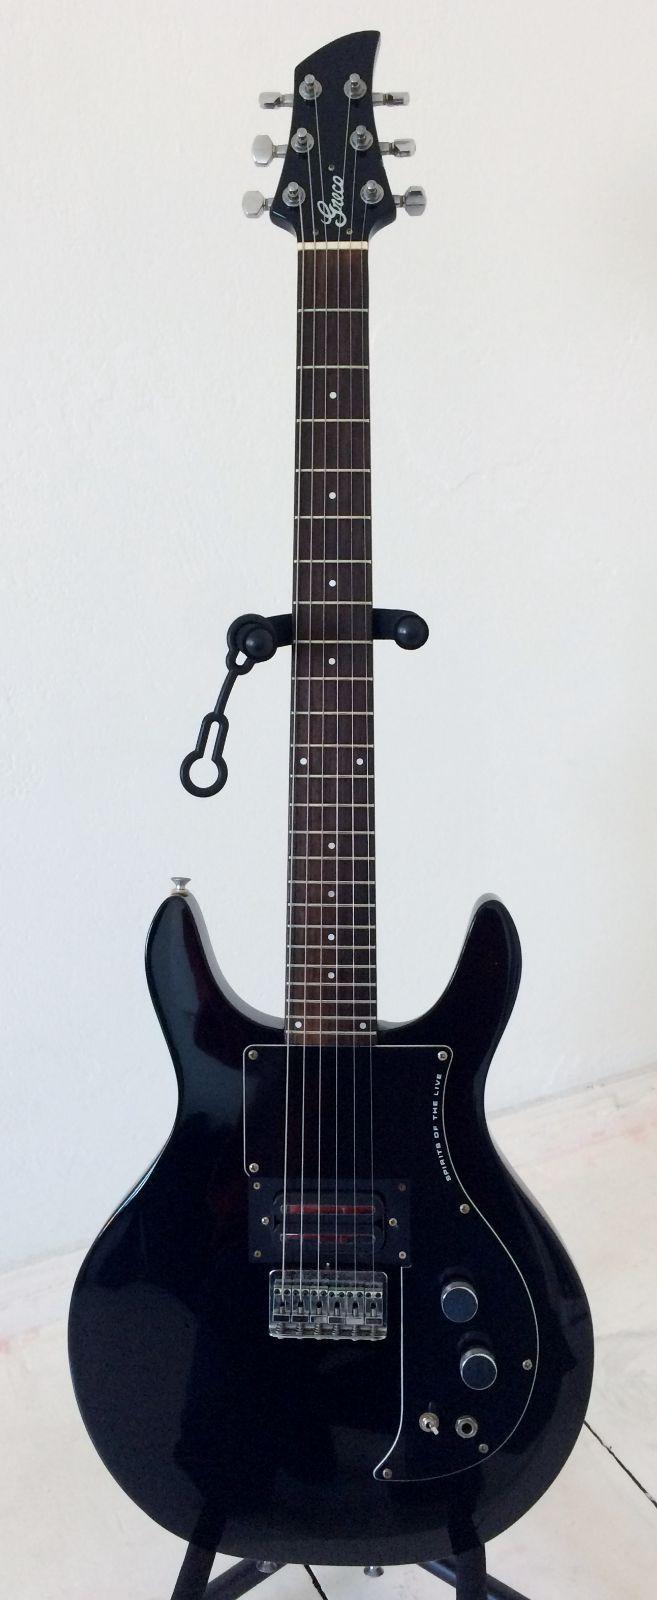 Gitara Greco APW-500 1990 Fujigen Japan MIJ